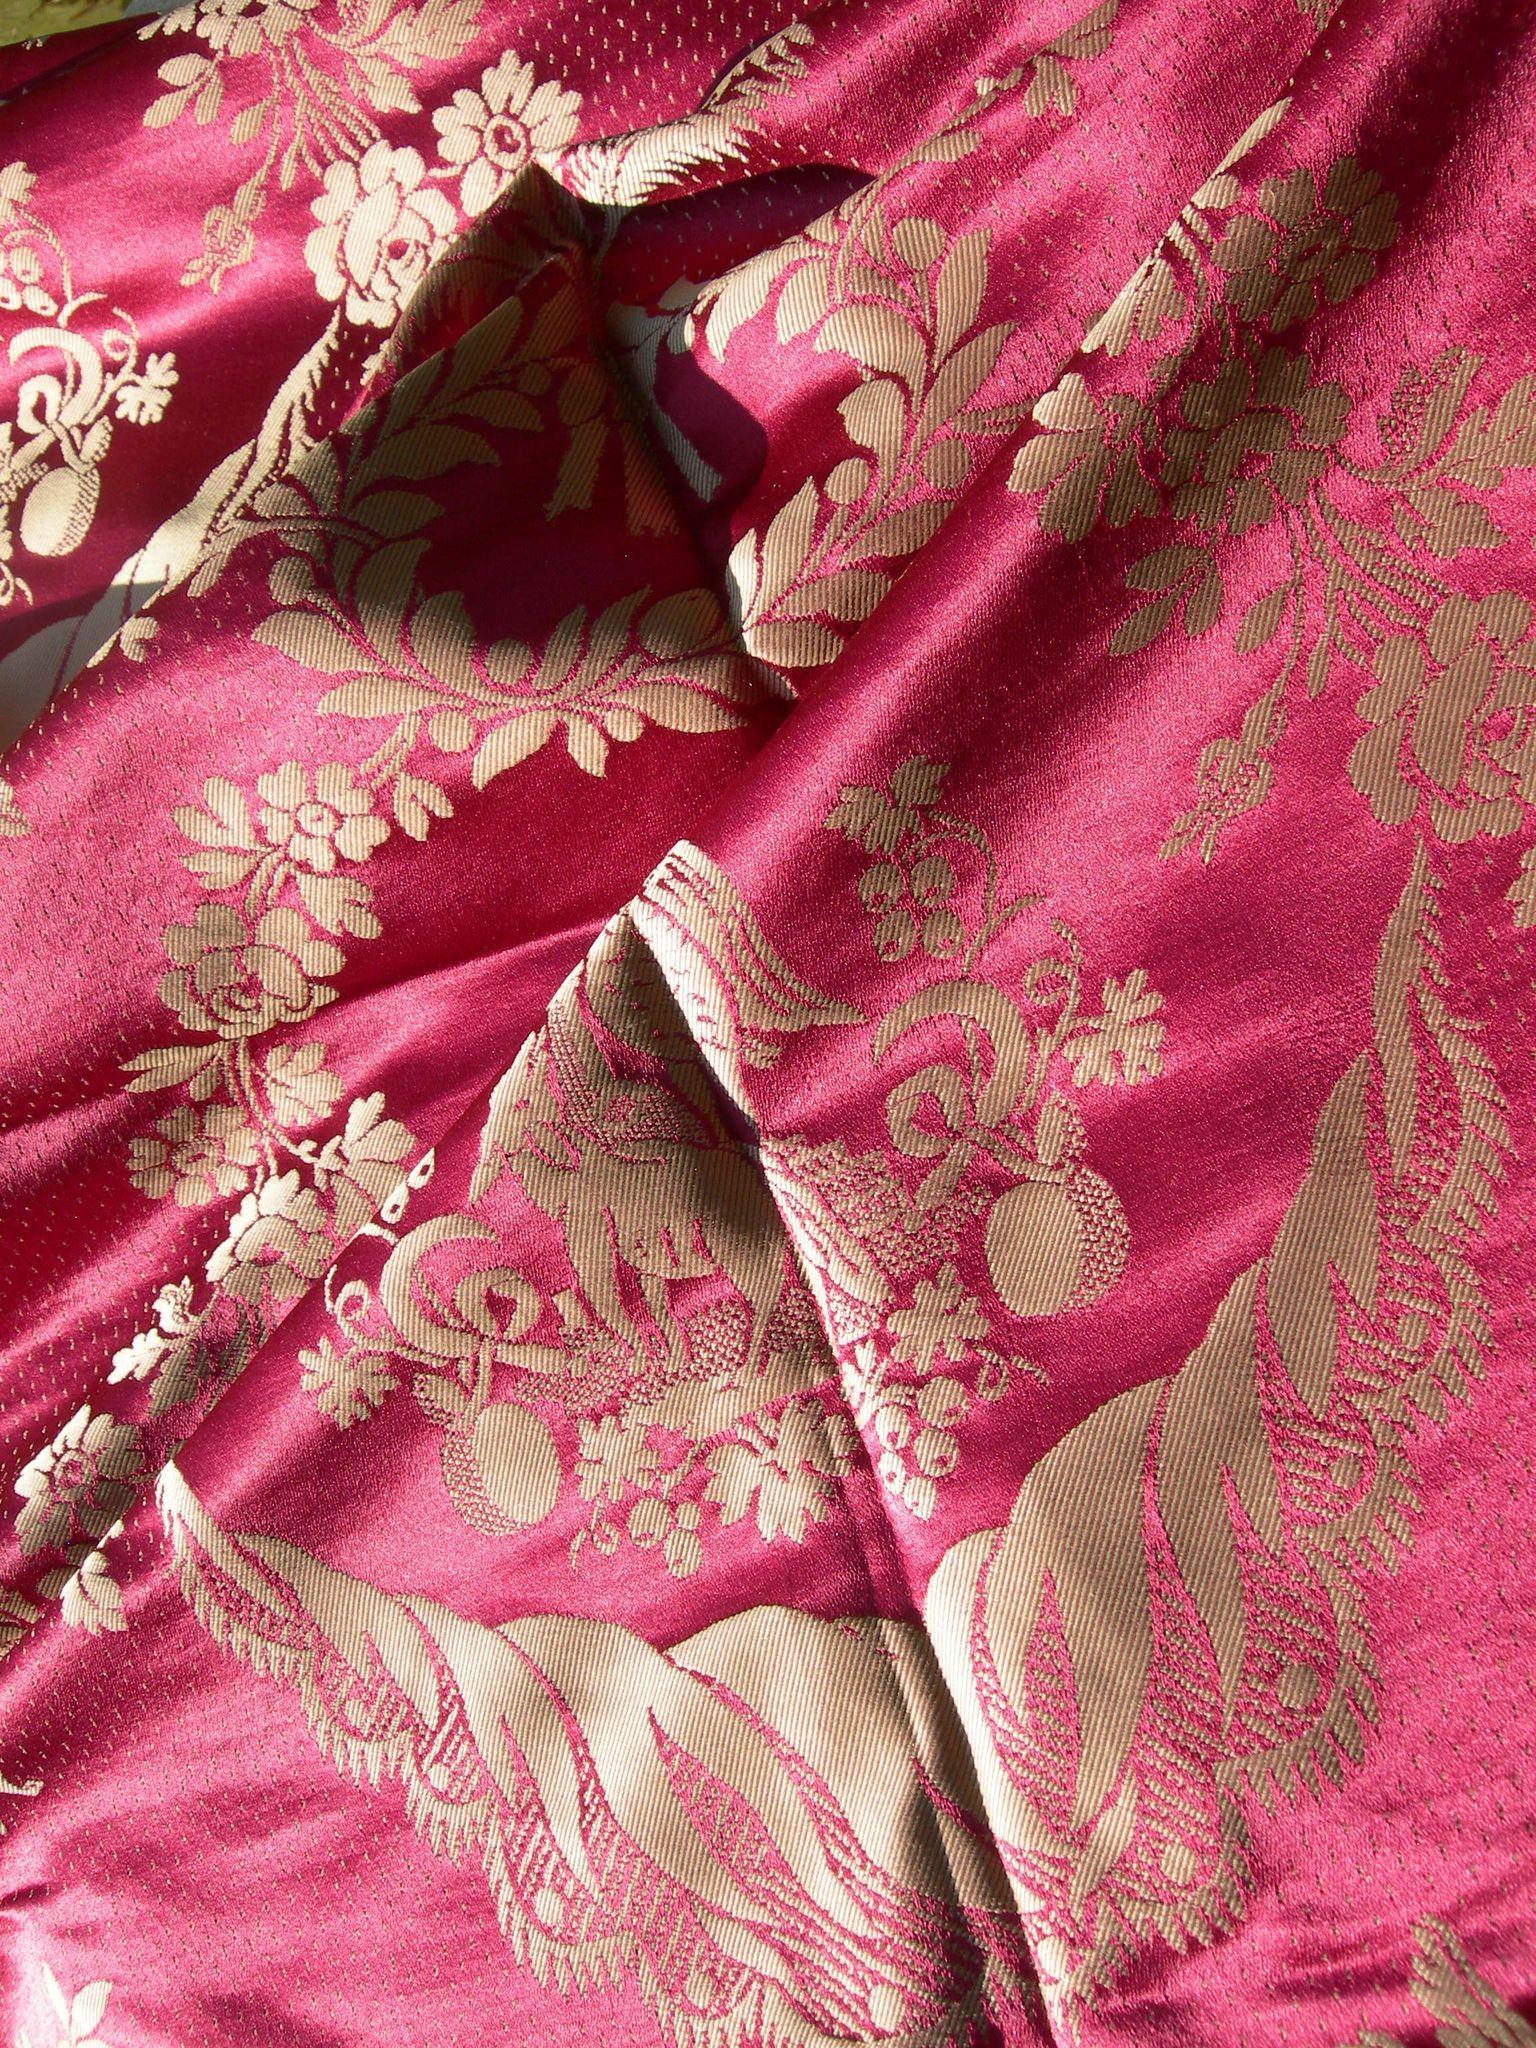 Large panel antique French 19th Century woven silk damask - Maison Hamot archive sample